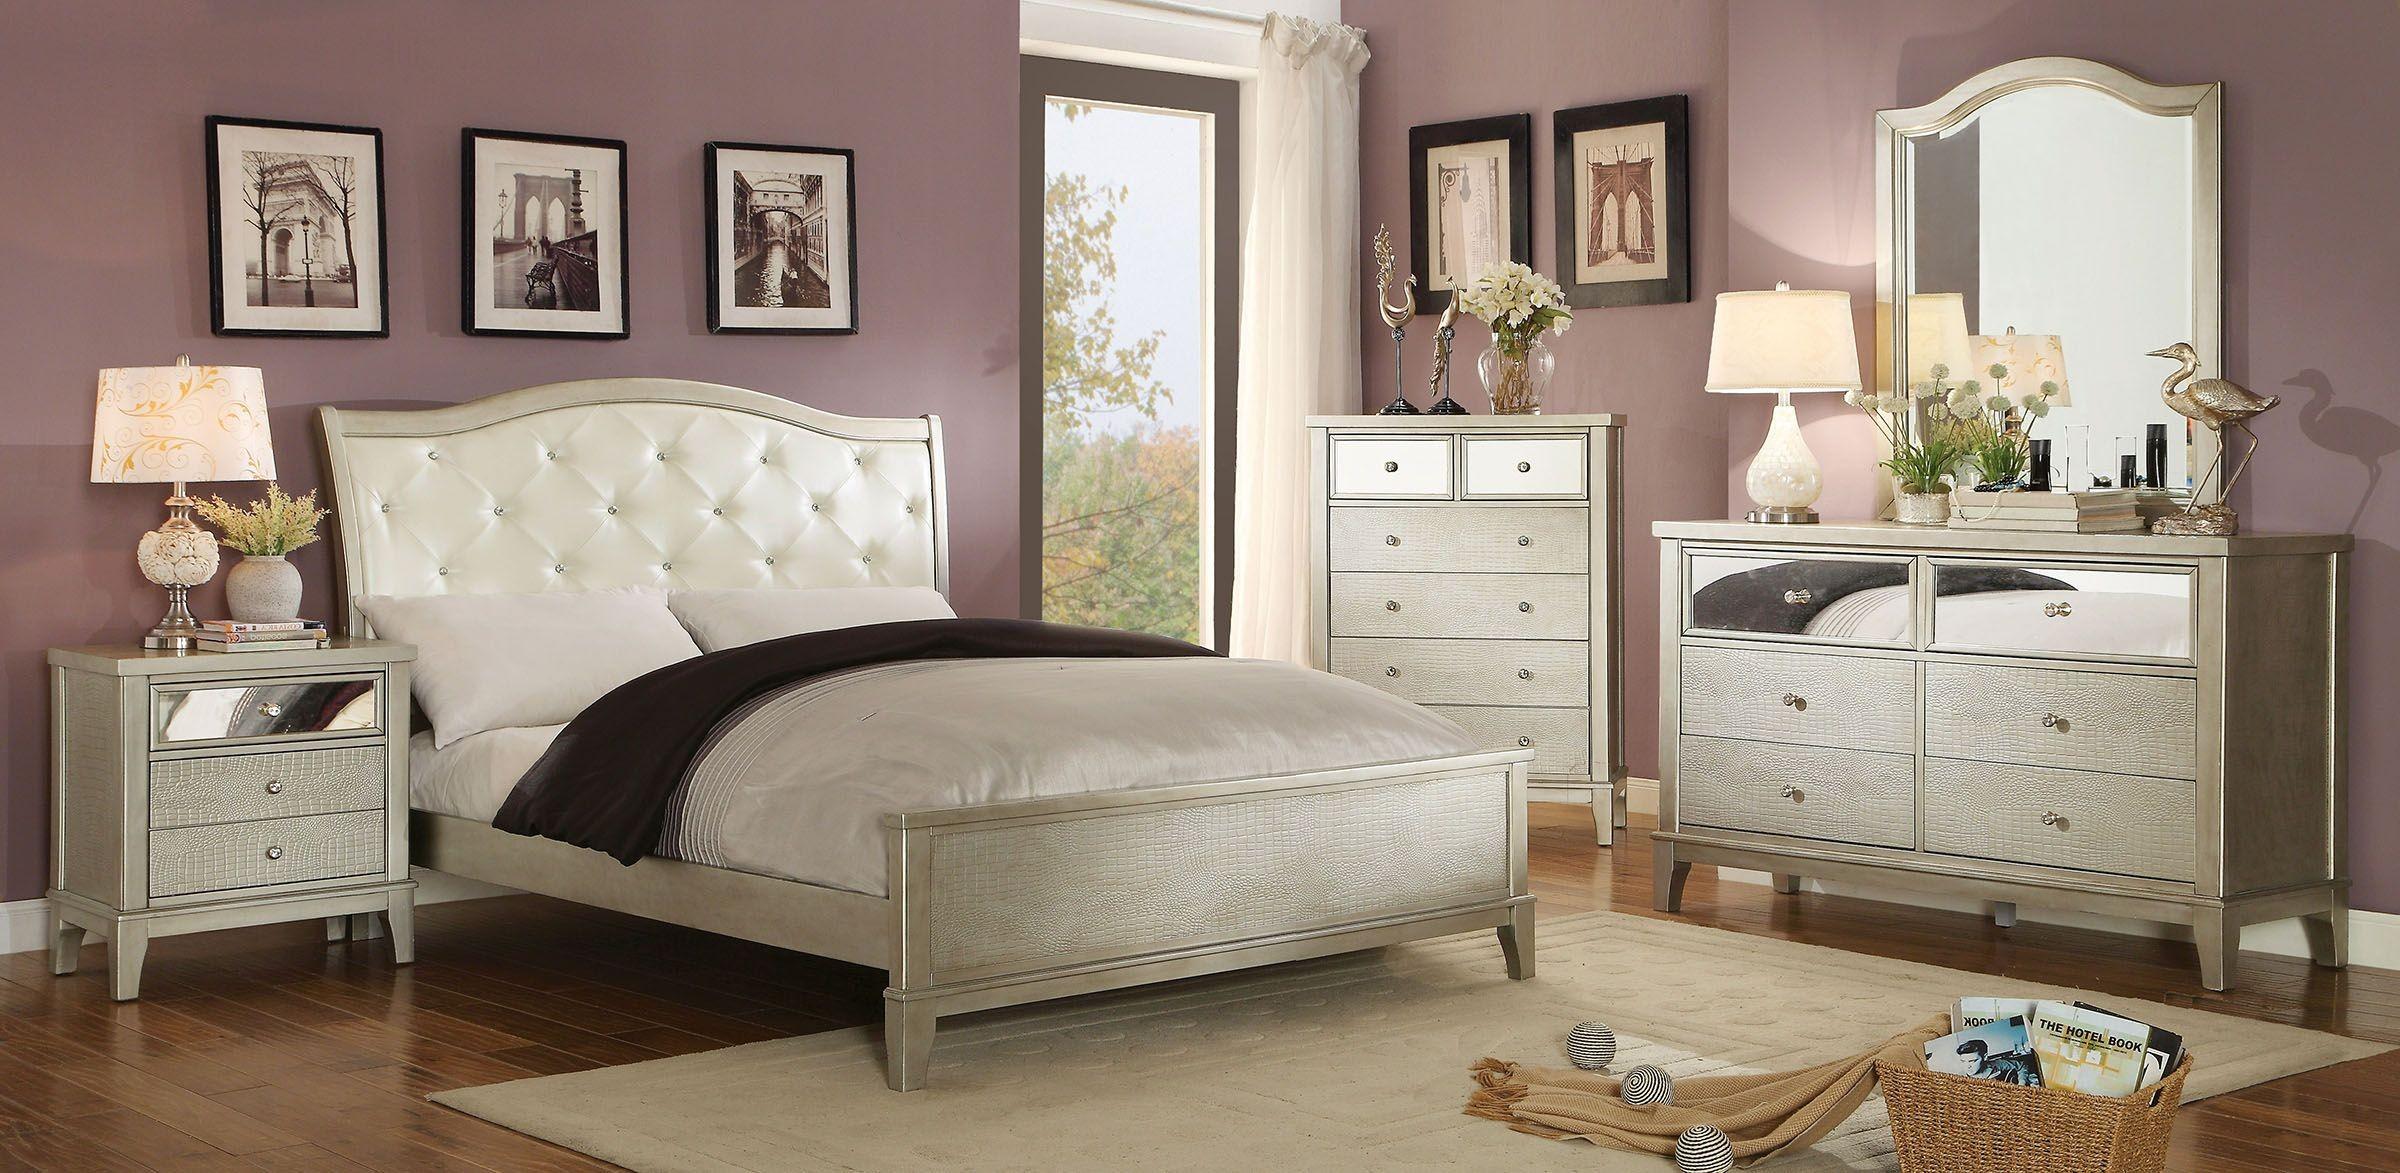 Adeline silver upholstered bedroom set from furniture of america coleman furniture - America bedroom furniture ...